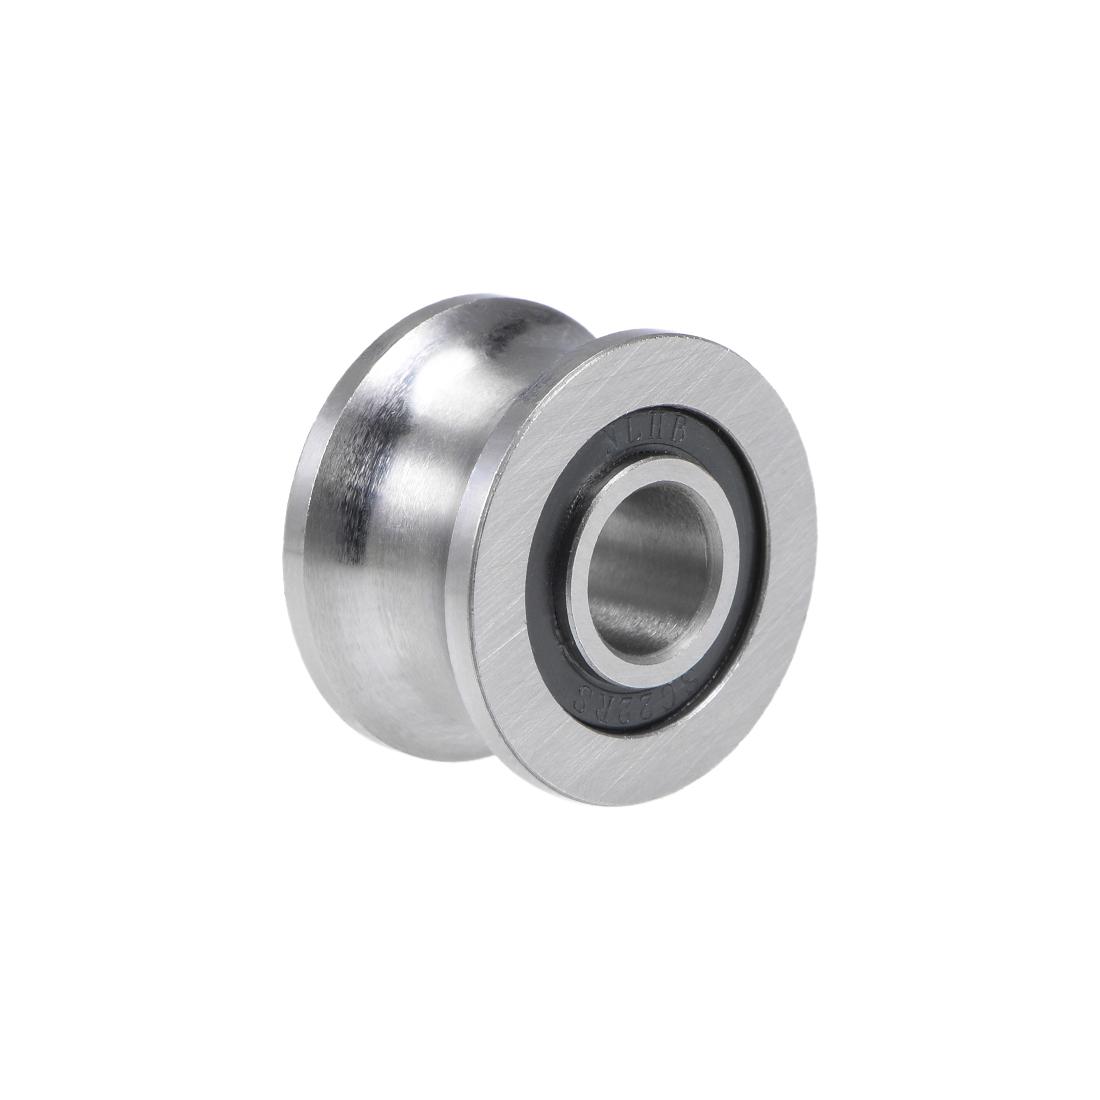 U22 U-Groove Ball Bearing 8x22.5x13.5mm Guide Pulley Bearings for 12mm Shaft